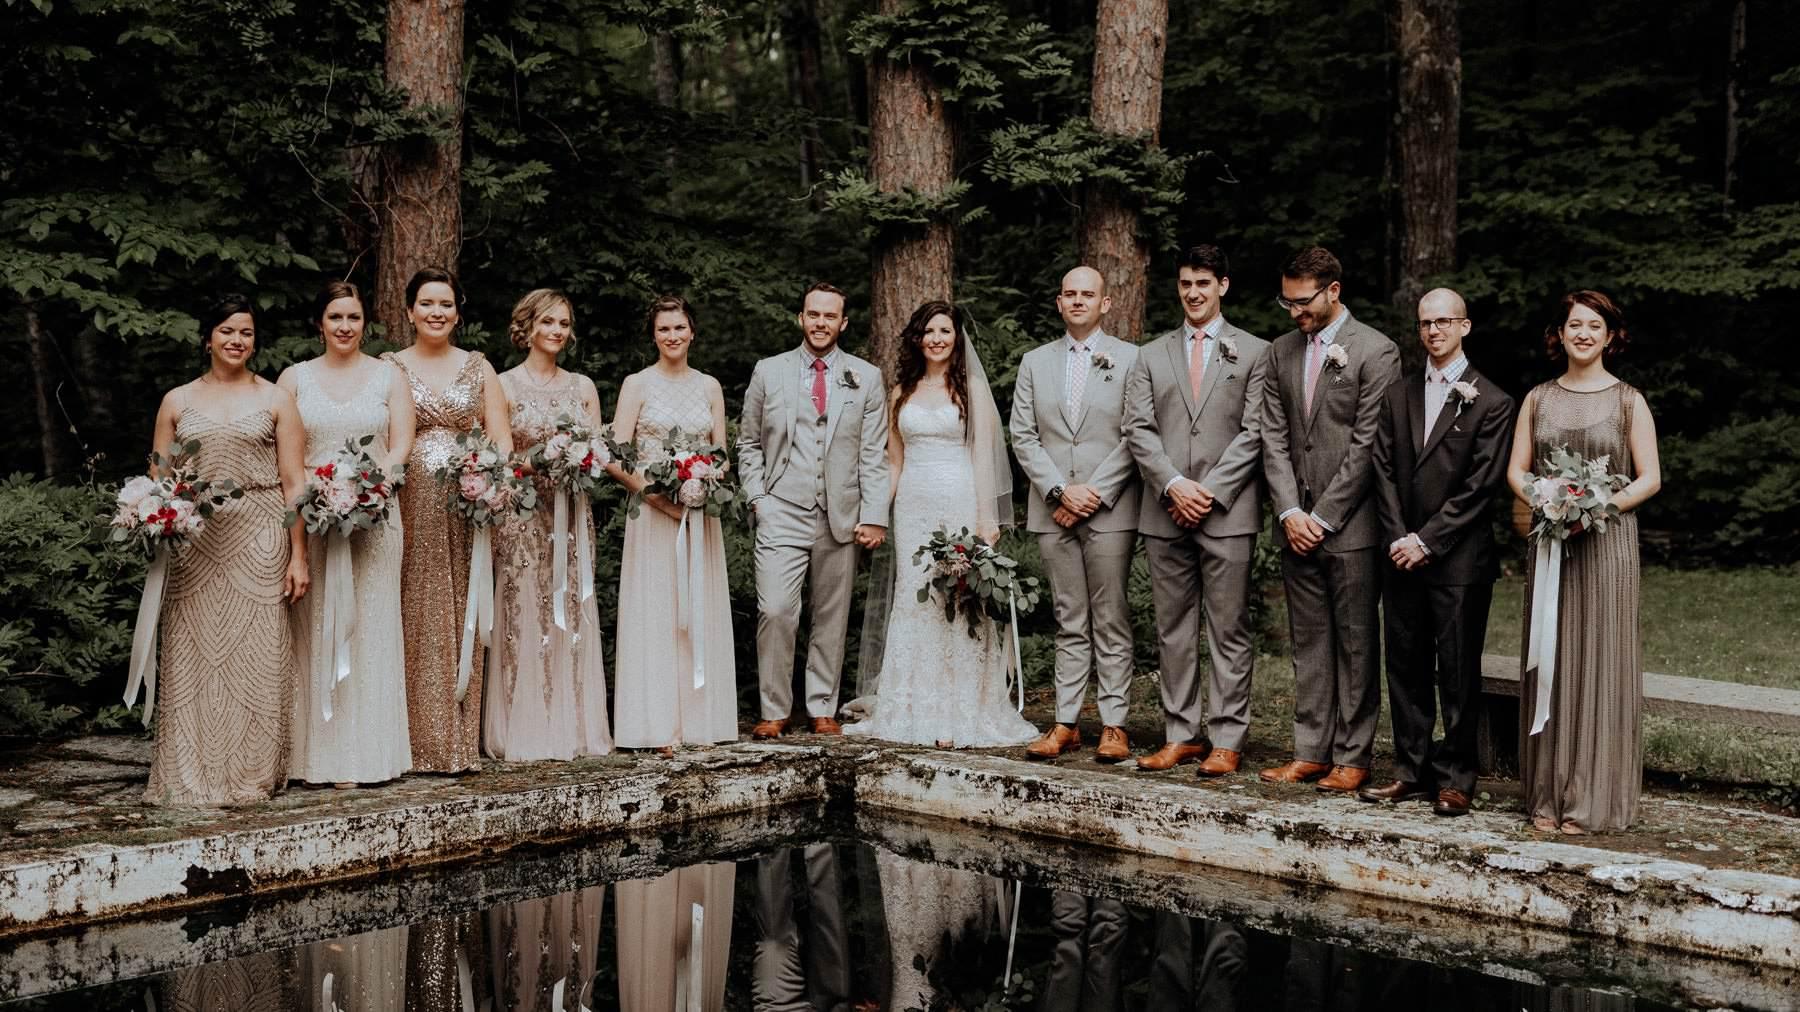 Onteora-Mountain-House-wedding-photographer-70.jpg